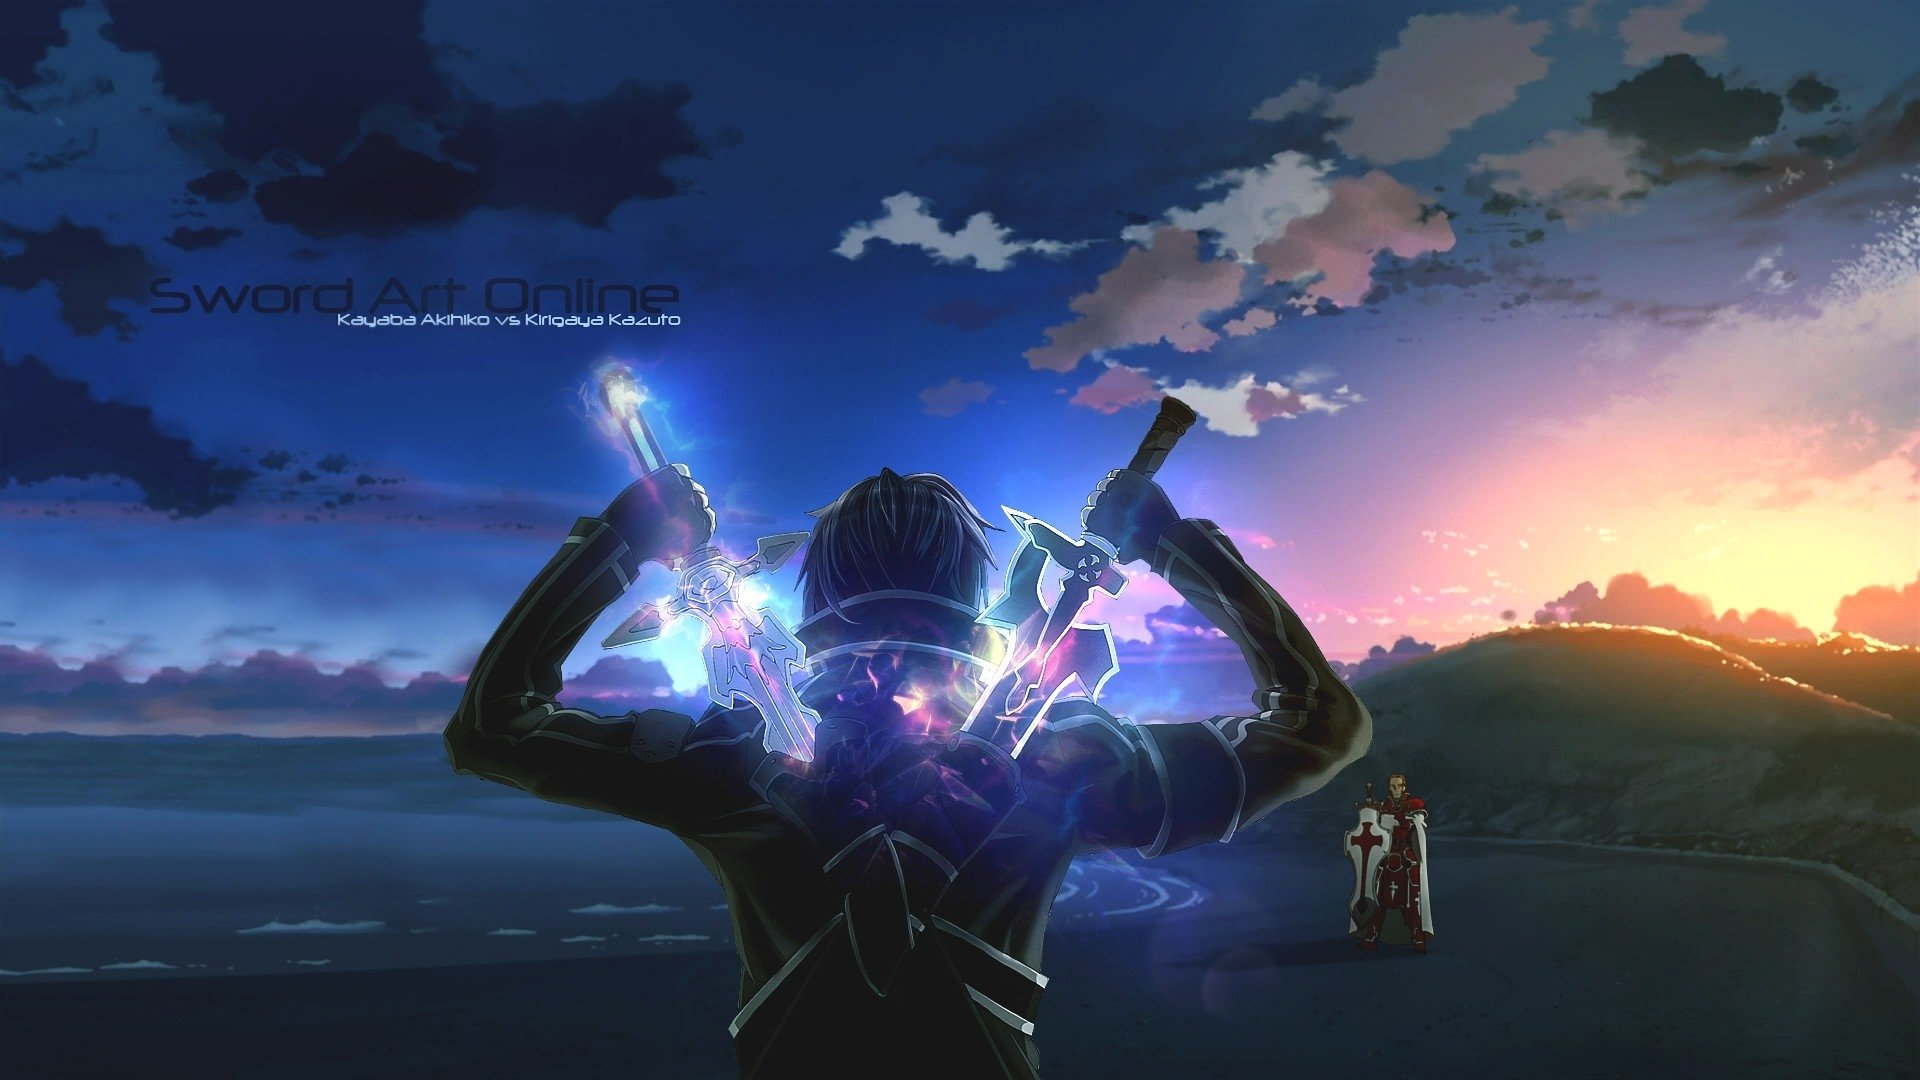 Anime - Sword Art Online  Anime Kirito (Sword Art Online) Kayaba Akihiko Sword Weapon Sunrise Wallpaper